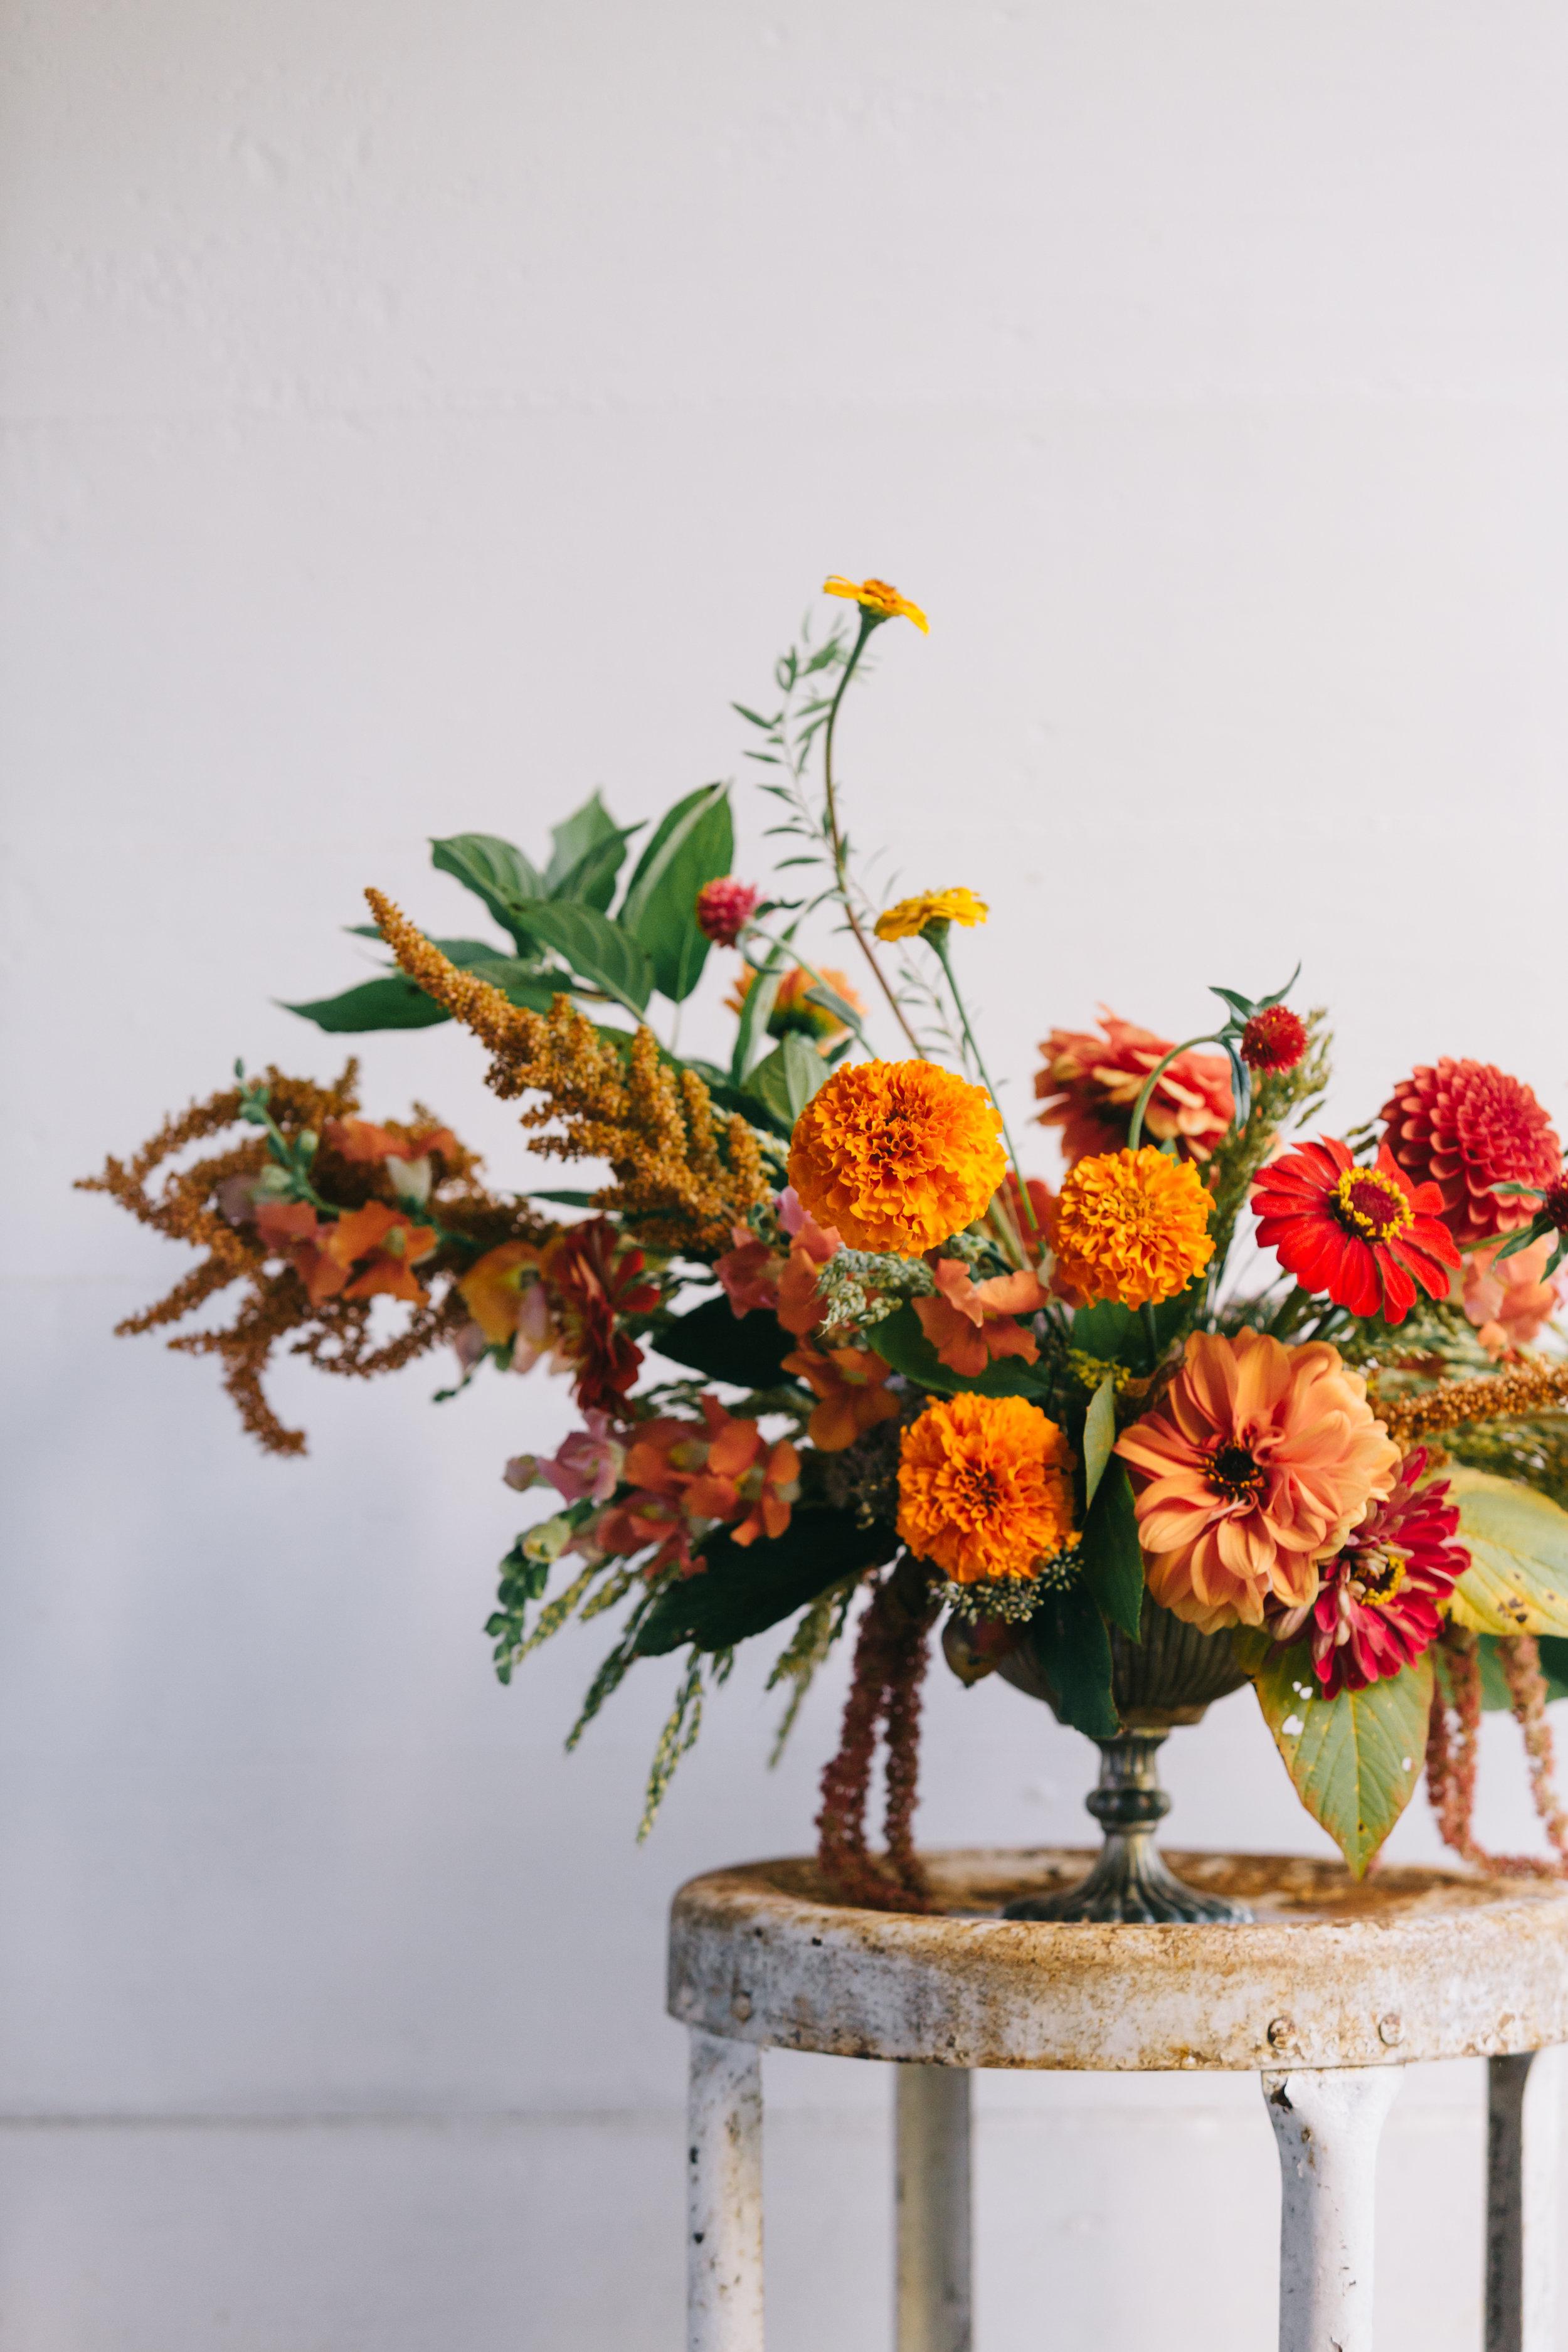 Arrangement by Elizabeth at A Floral Note  Anna Hedges Photography